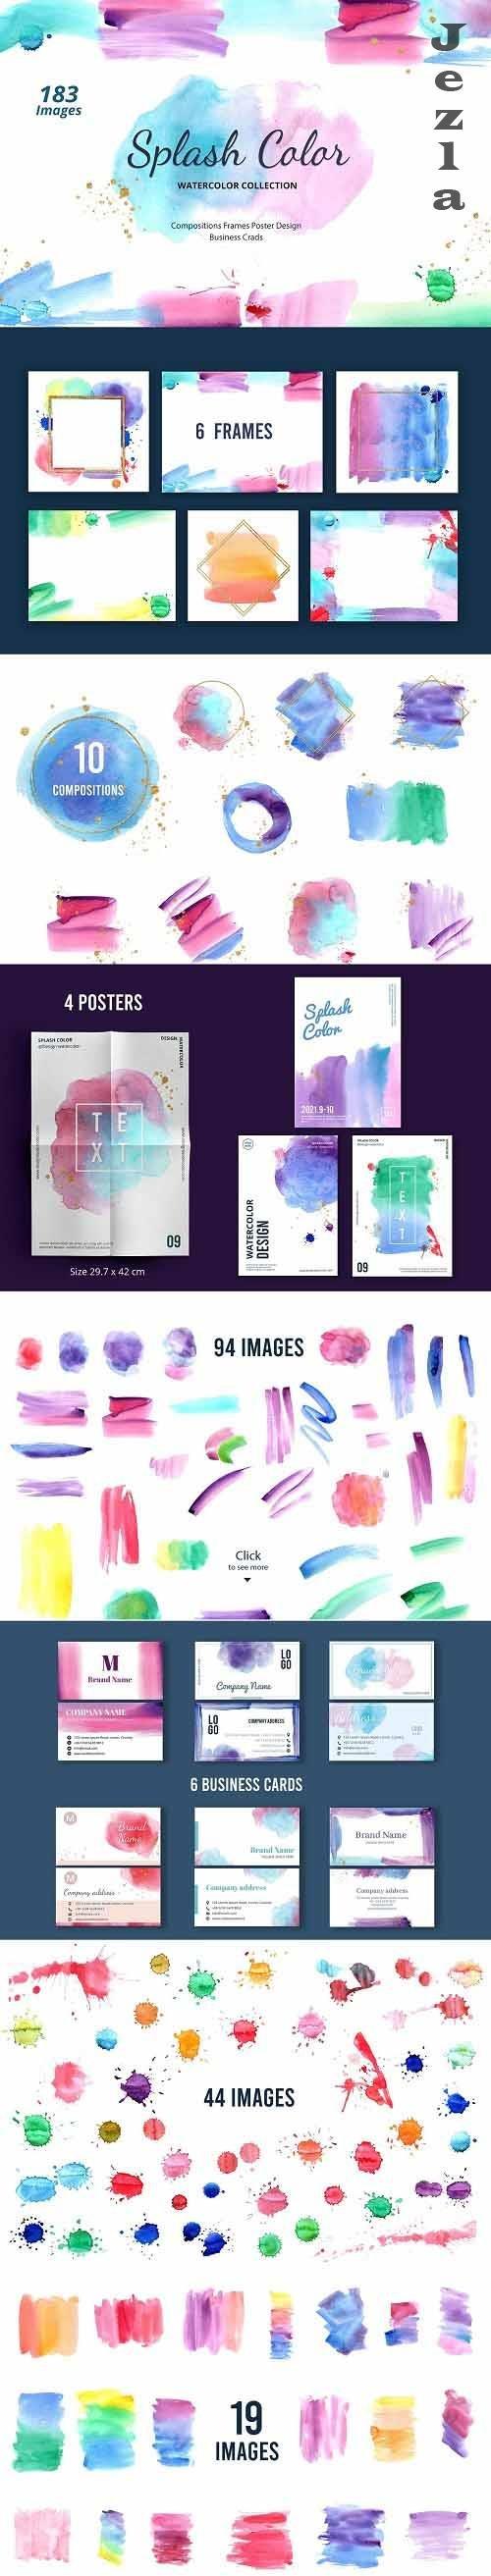 Splash Colorful Rainbow Watercolor - 5729537